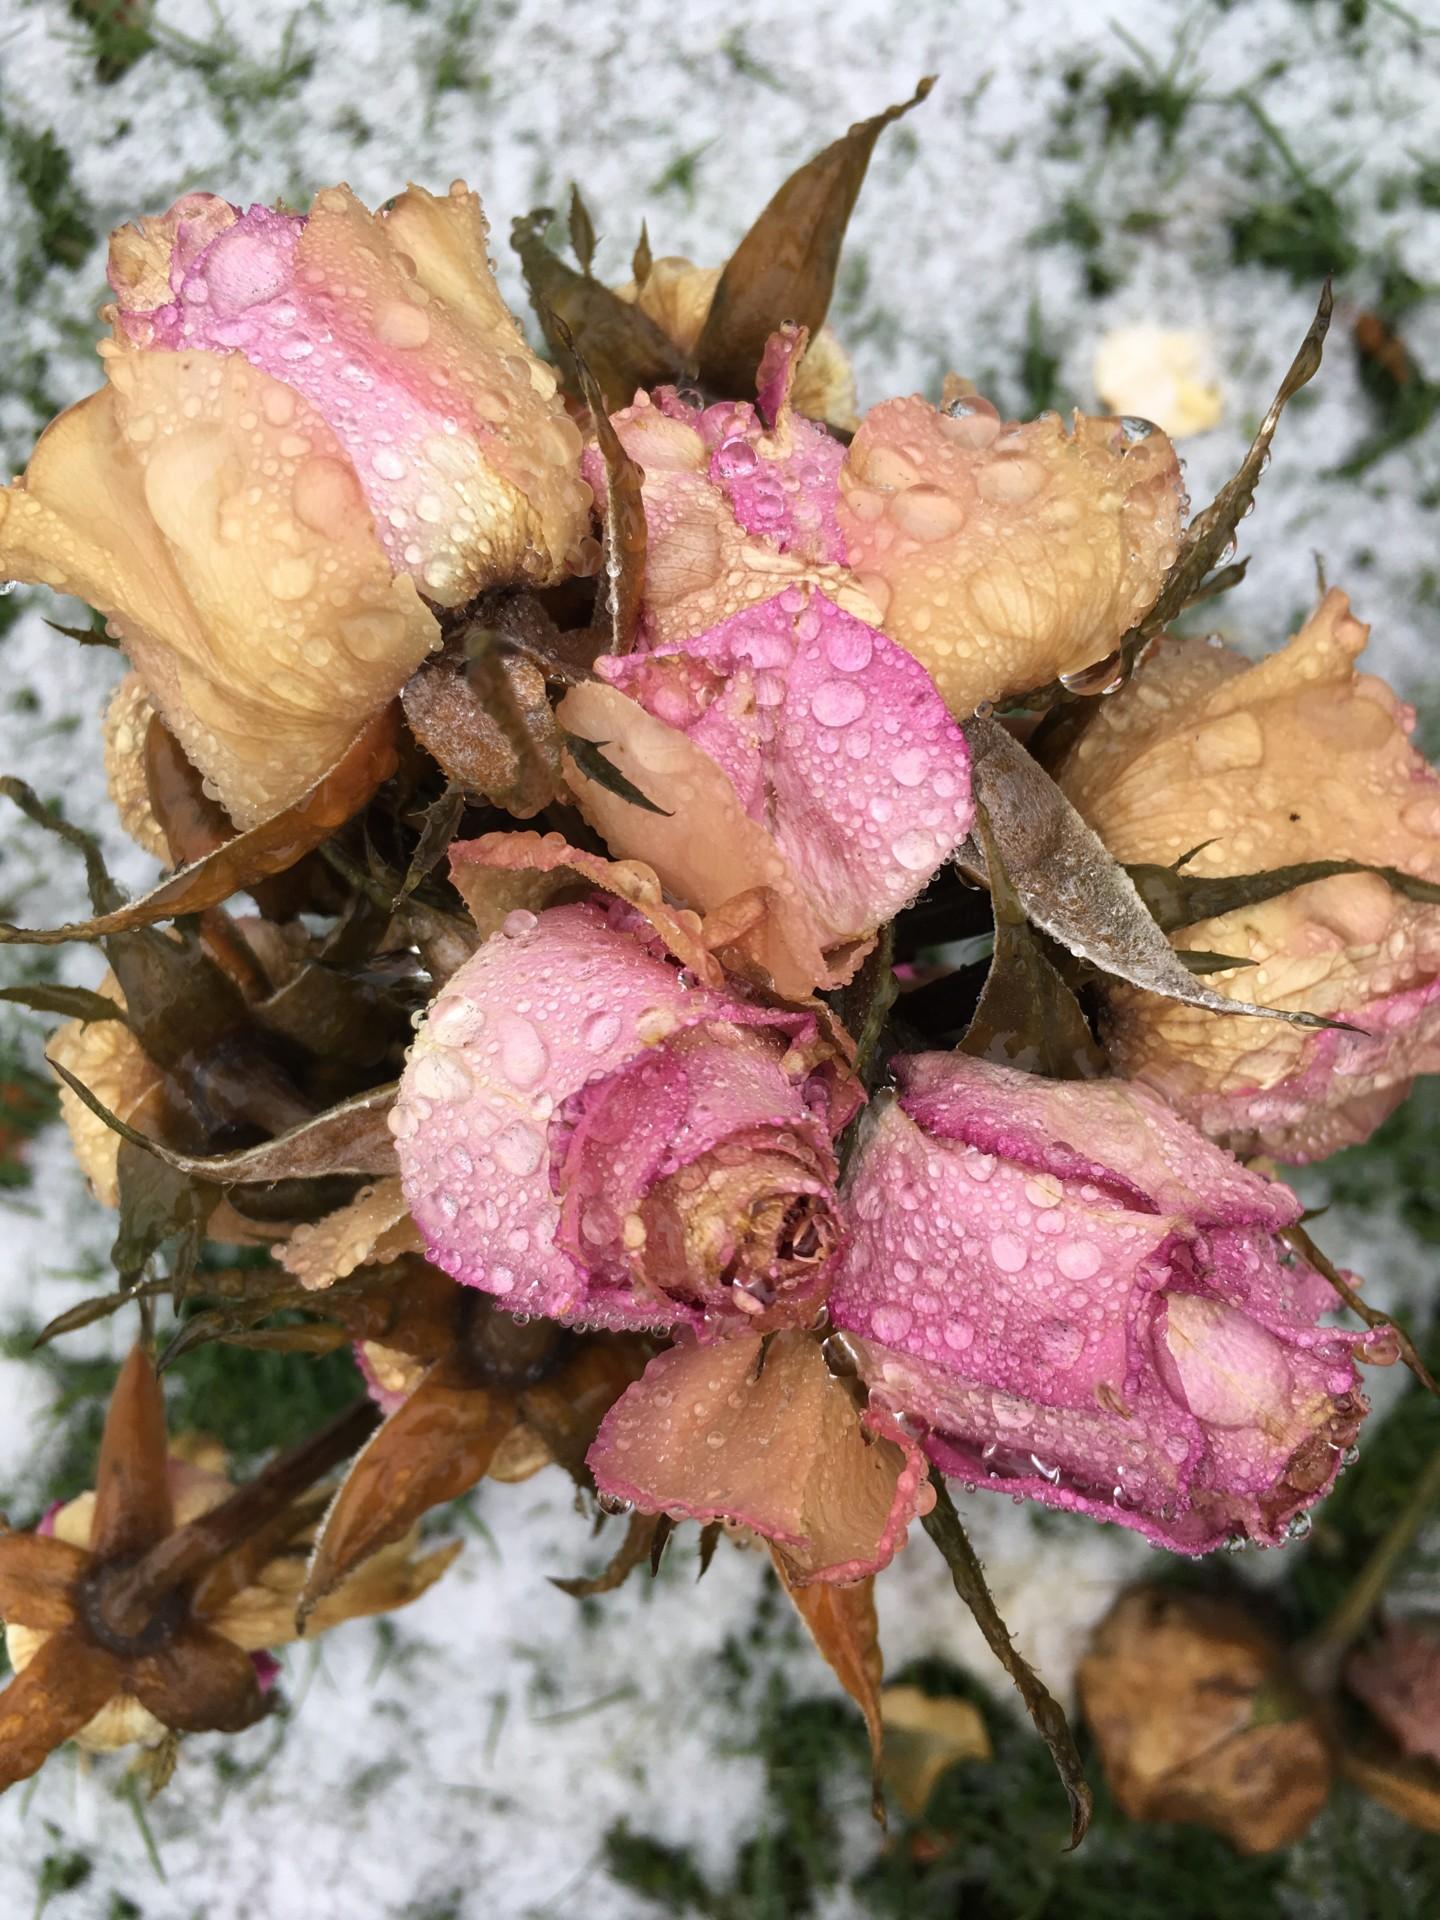 Paul Yves Poumay - roses perlées